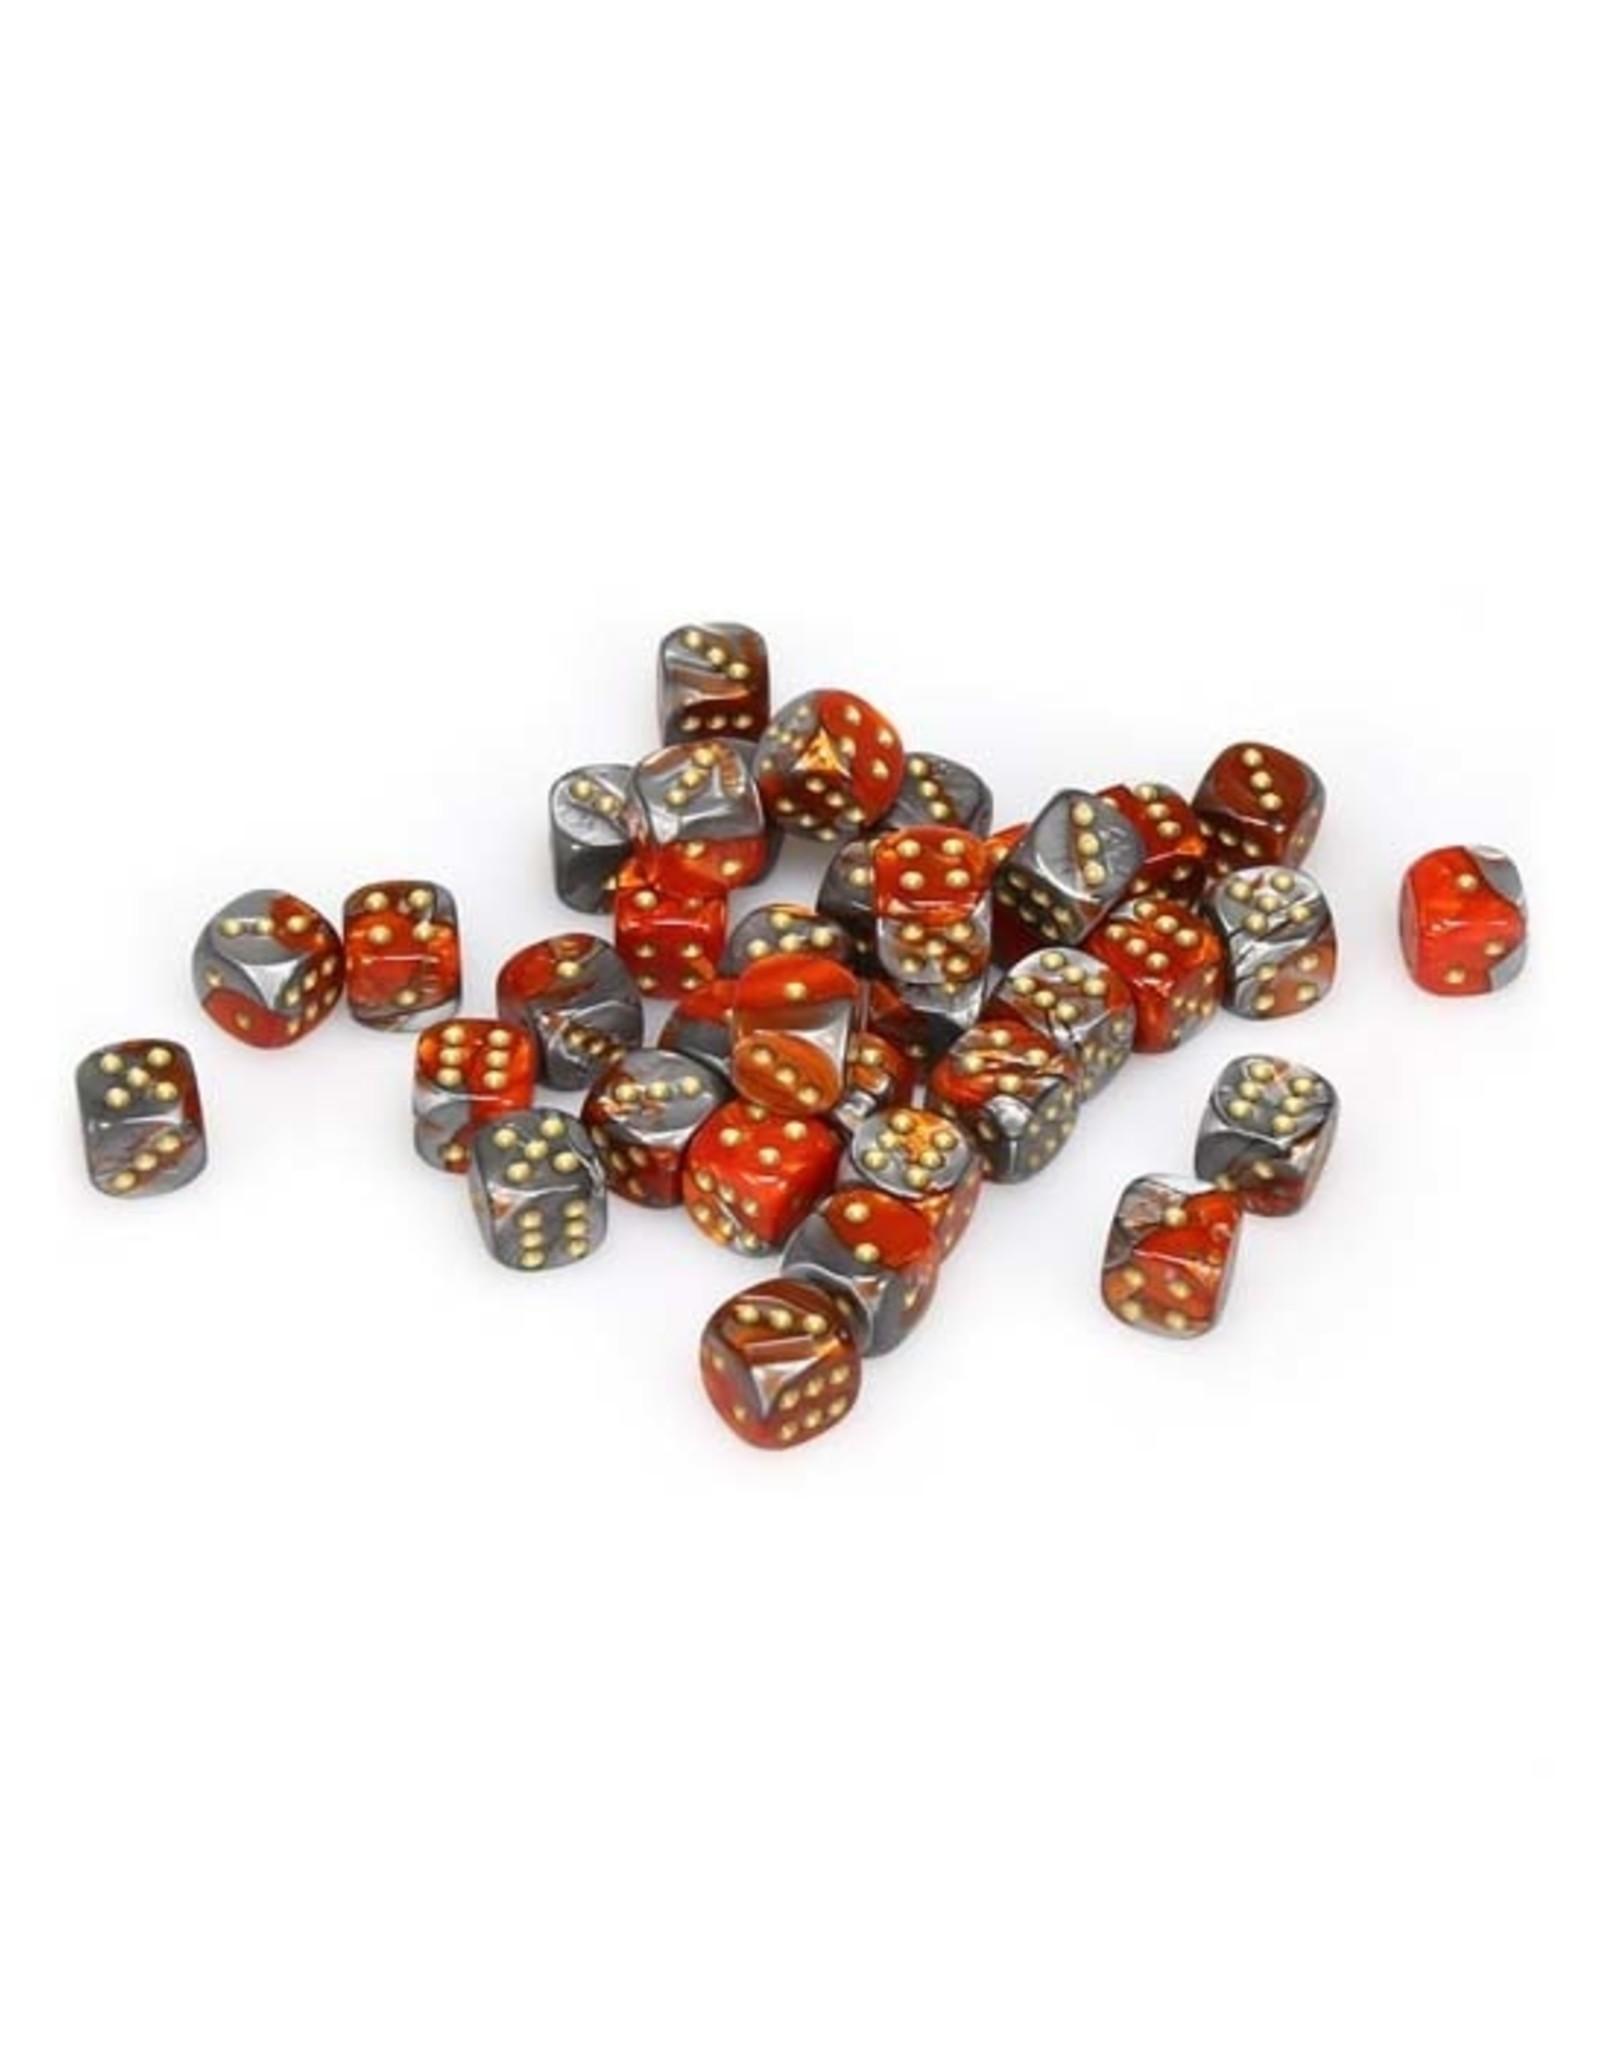 Chessex Chessex: 12mm D6 - Gemini - Orange-Steel w/ Gold